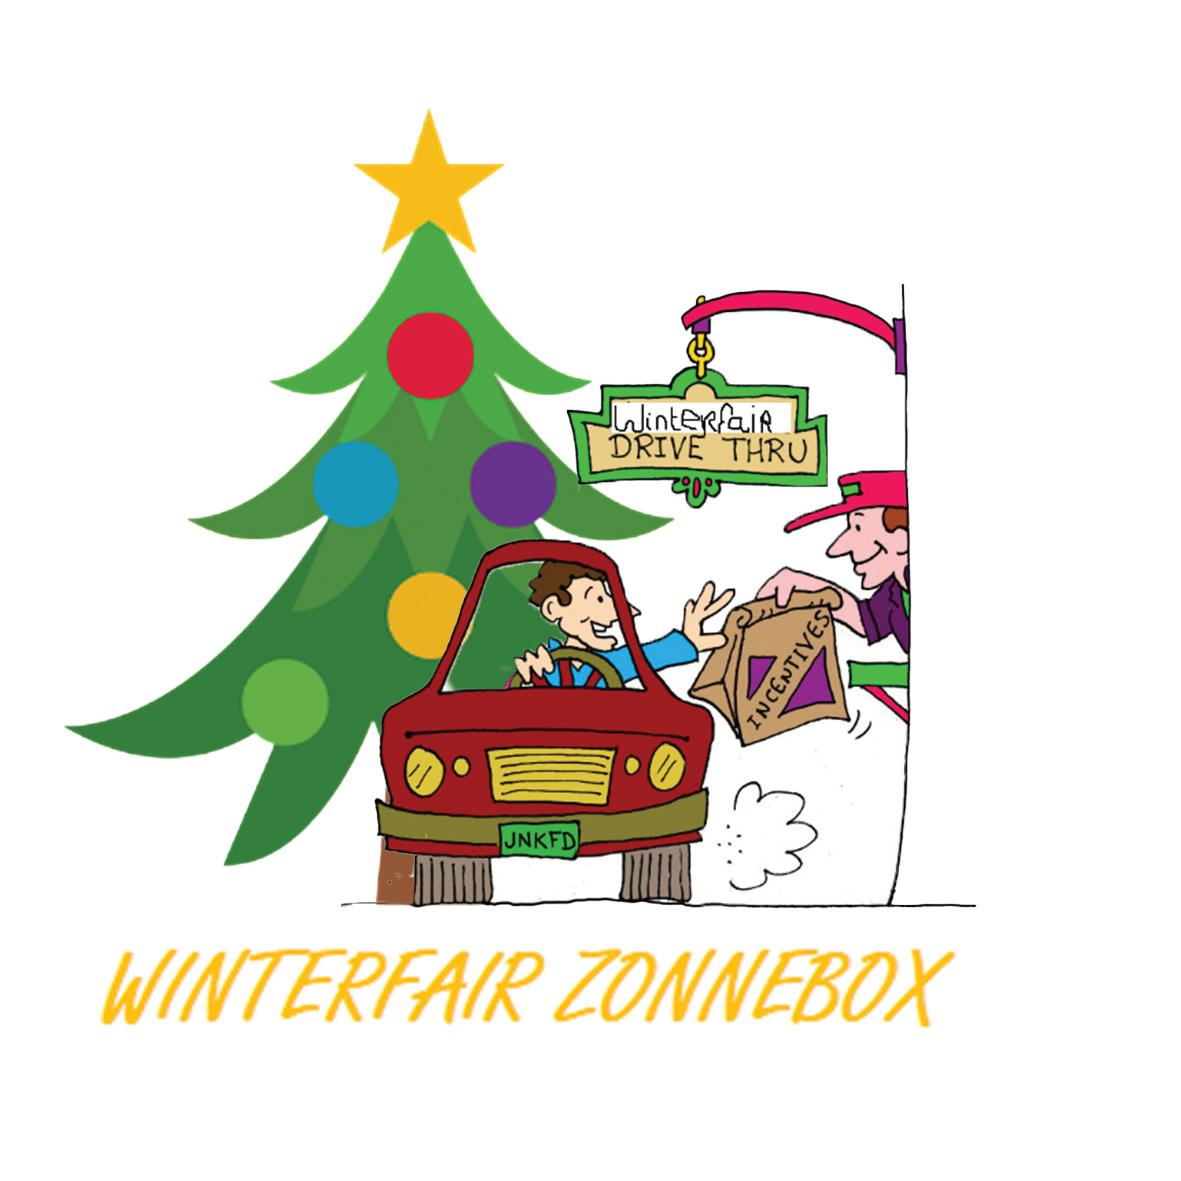 Winterfair Zonnebox